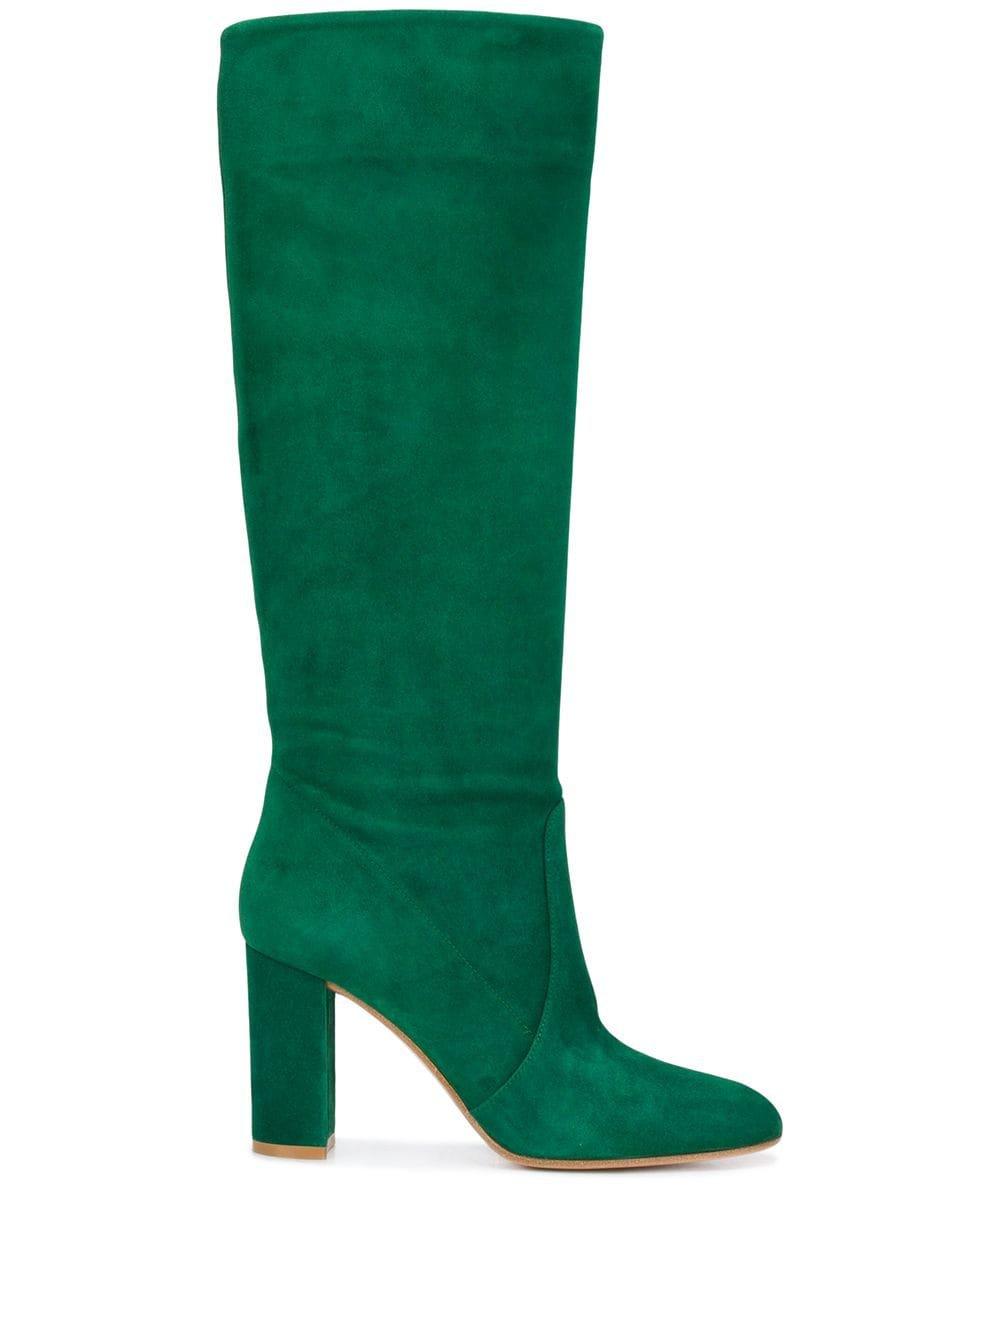 Gianvito Rossi Knee-Length Boots | Farfetch.com